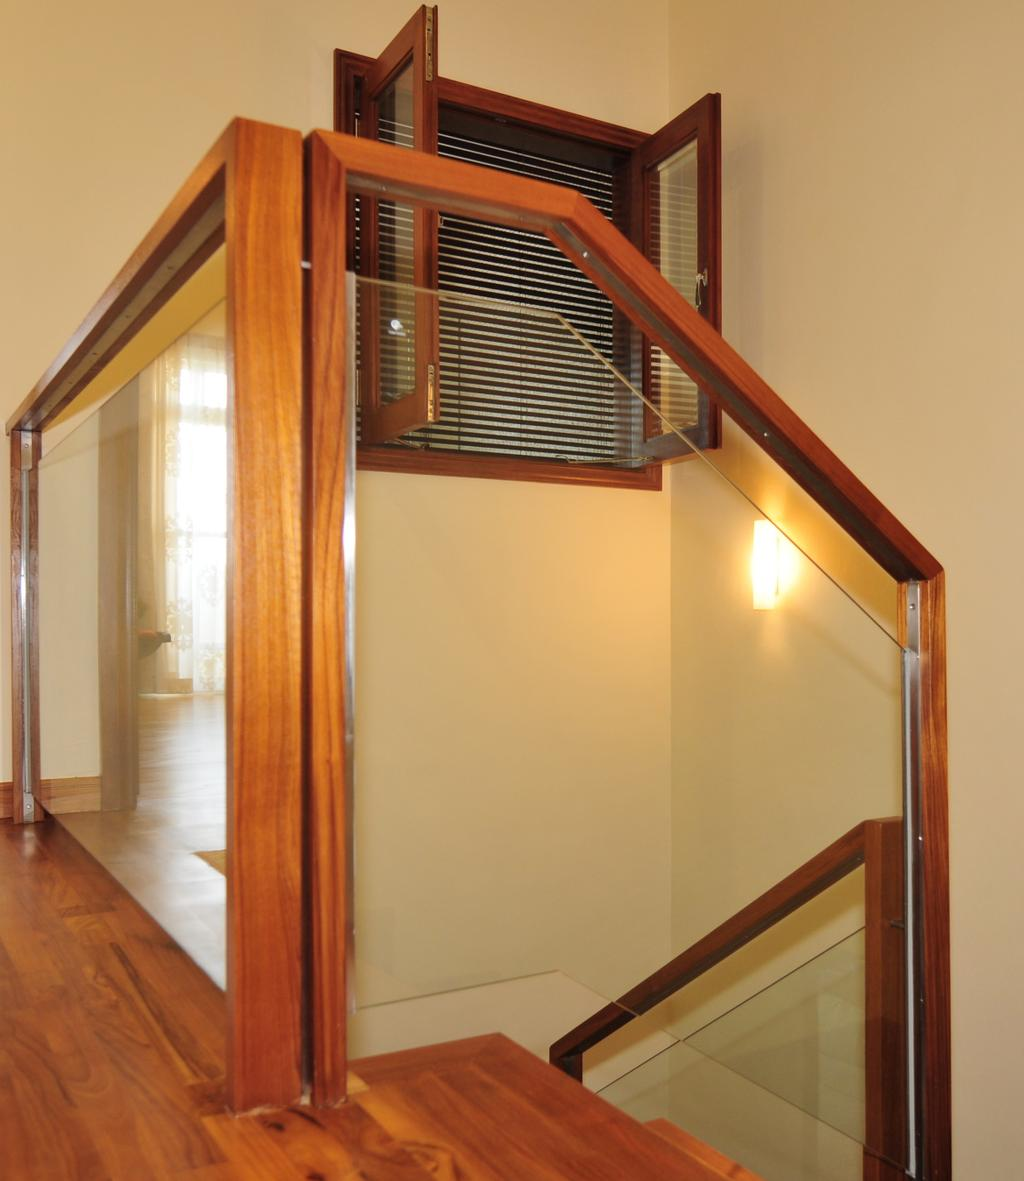 Transitional, Landed, Greenwood Avenue, Interior Designer, Seven Heaven, Banister, Handrail, Staircase